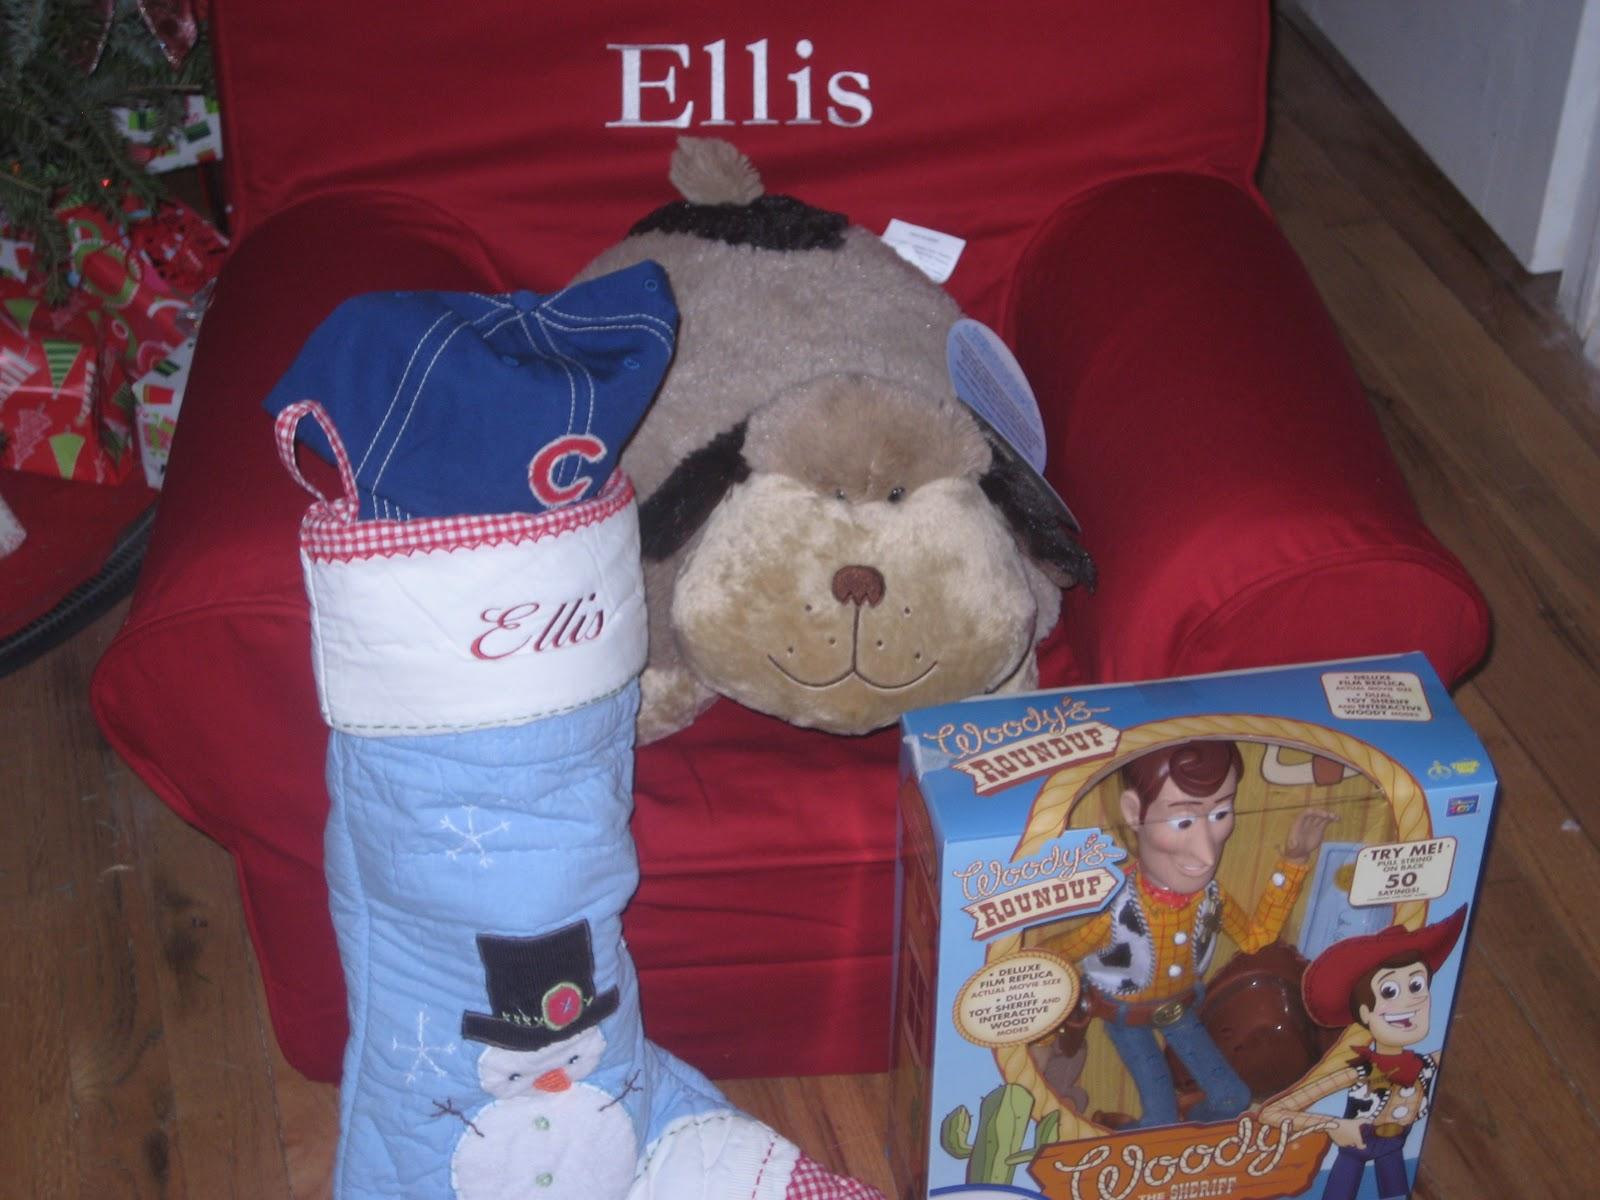 Panda Bean Bag Chair Desk Girl The Little Things My Christmas Morning